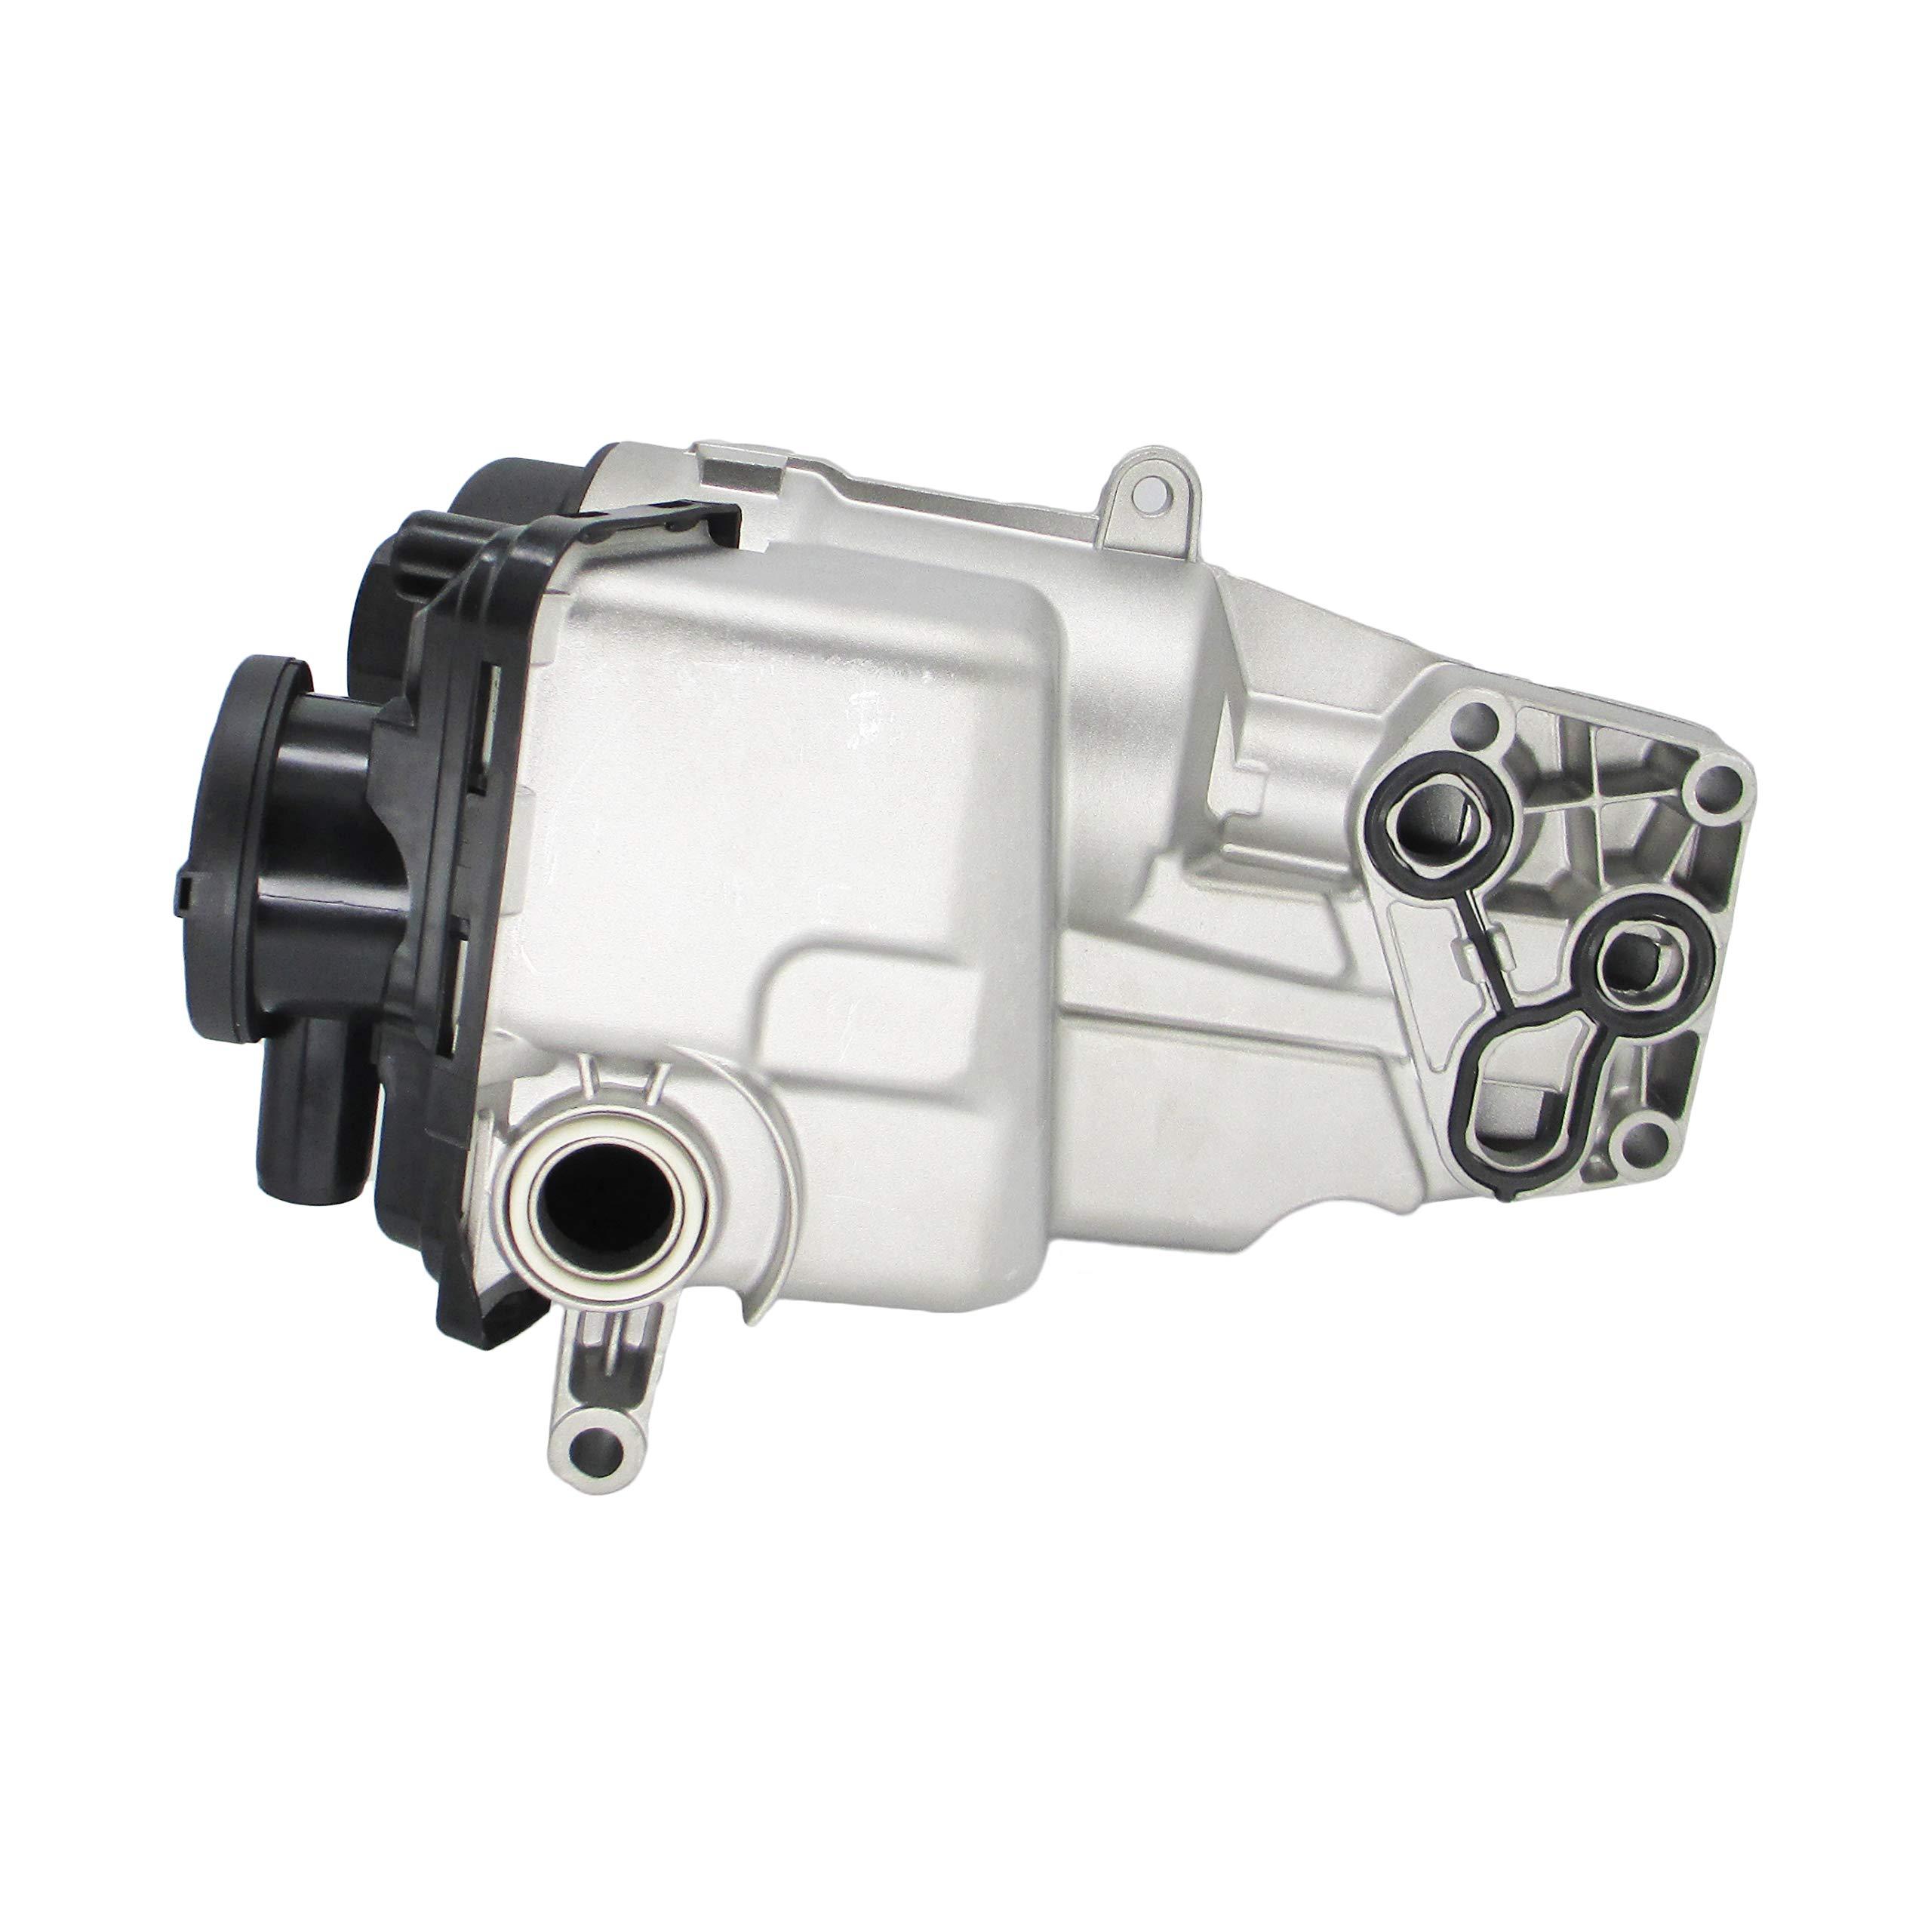 5 Cylinder Petrol Upper Engine Mount Right C70 C30 V50 Volvo S40